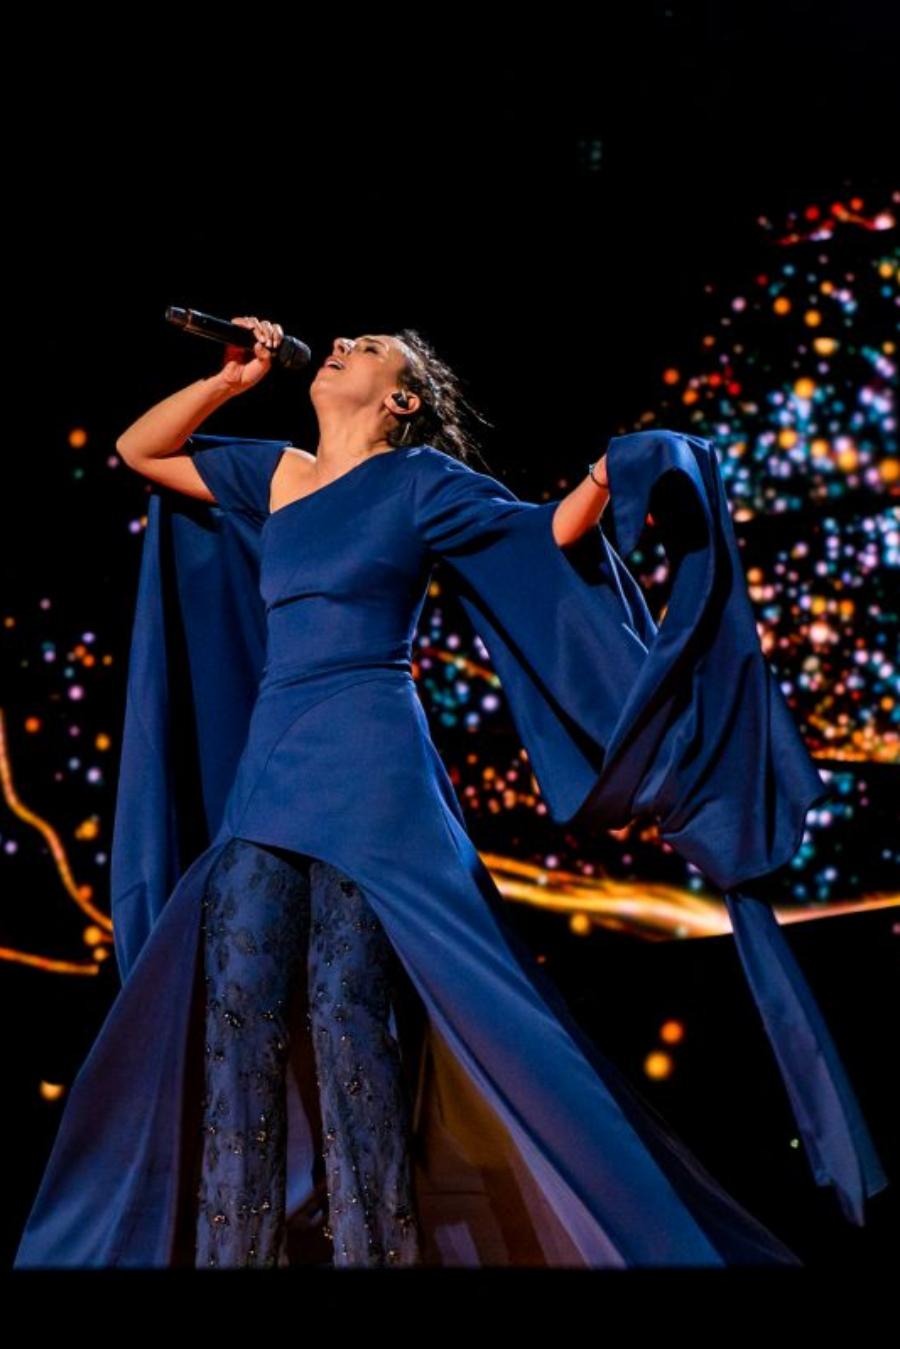 Eurovision Song Contest 2016: Ukraine